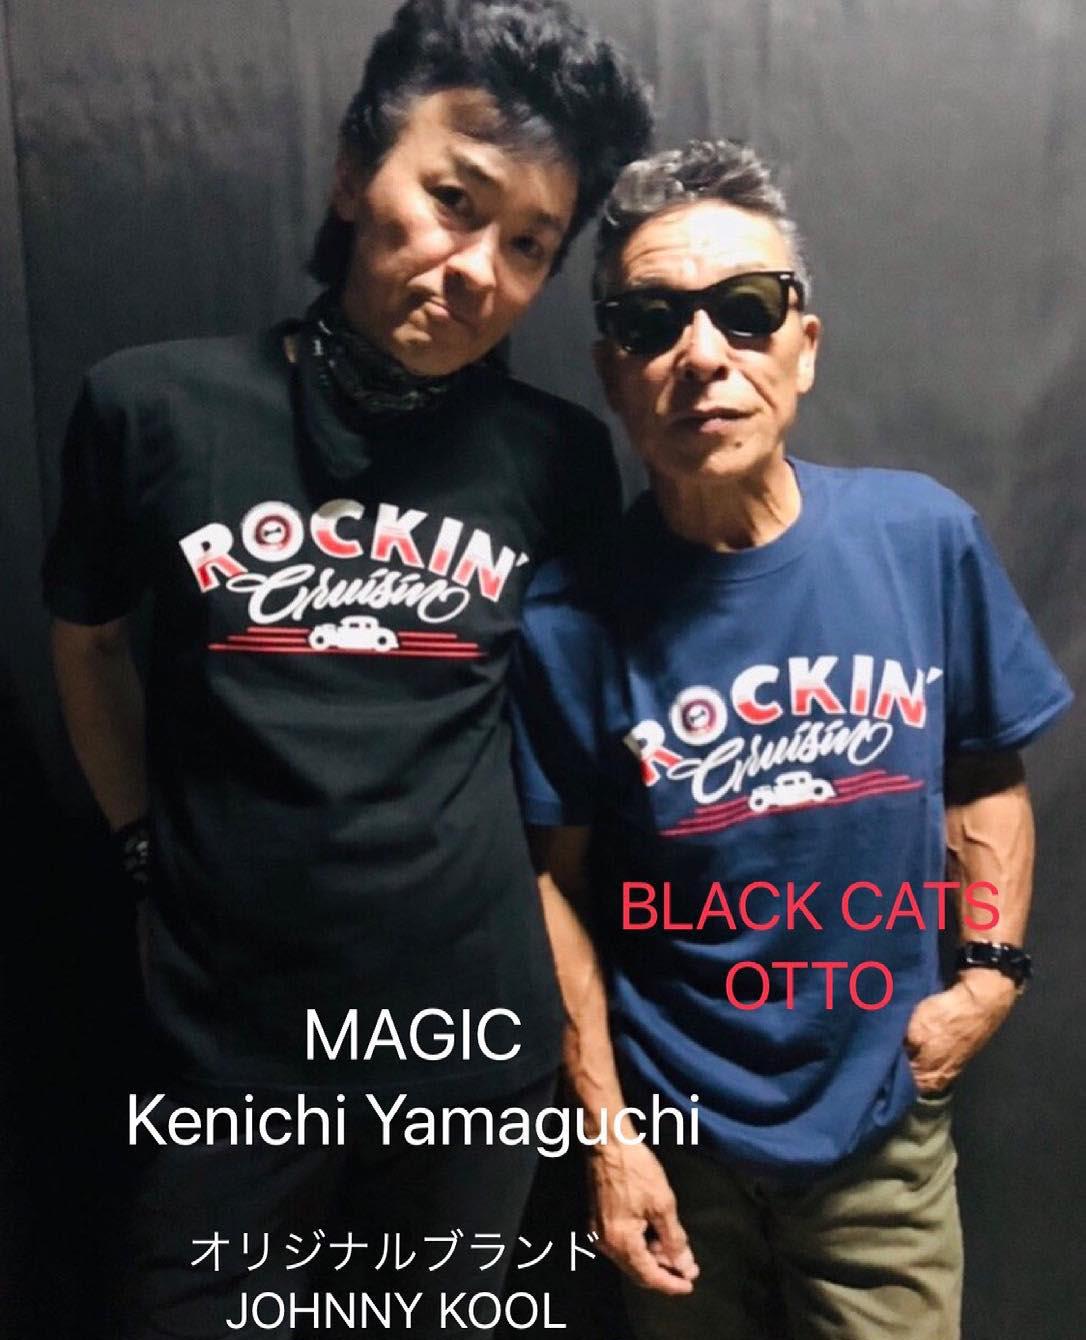 BLACK CATS OTTOさん・MAGIC山口 憲一